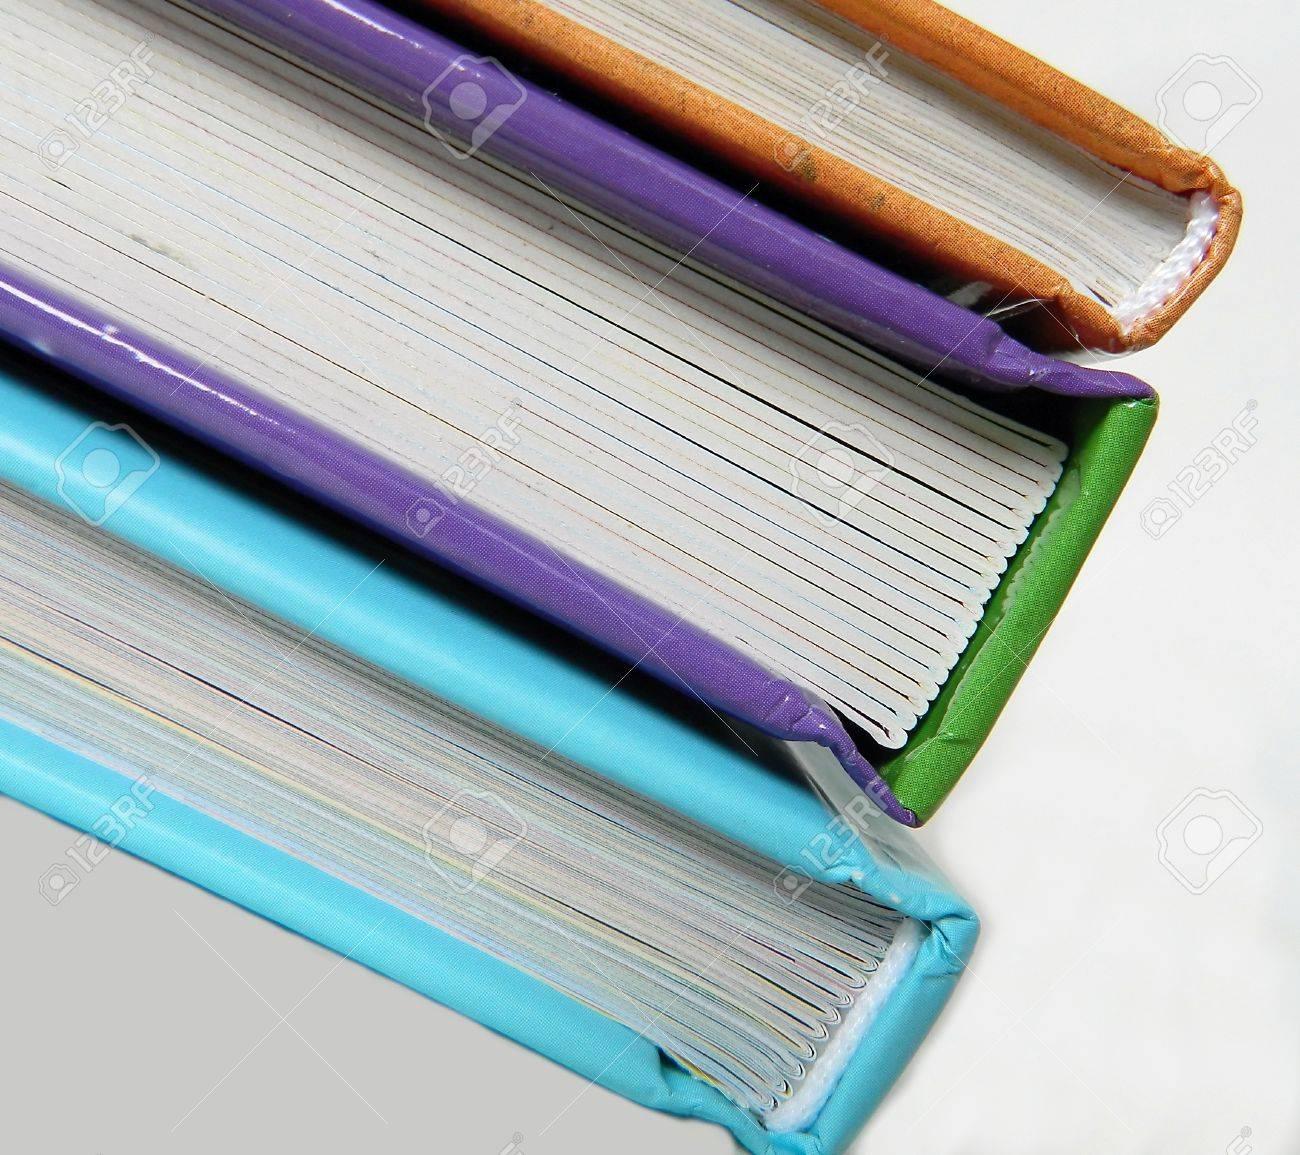 Books - 13357846